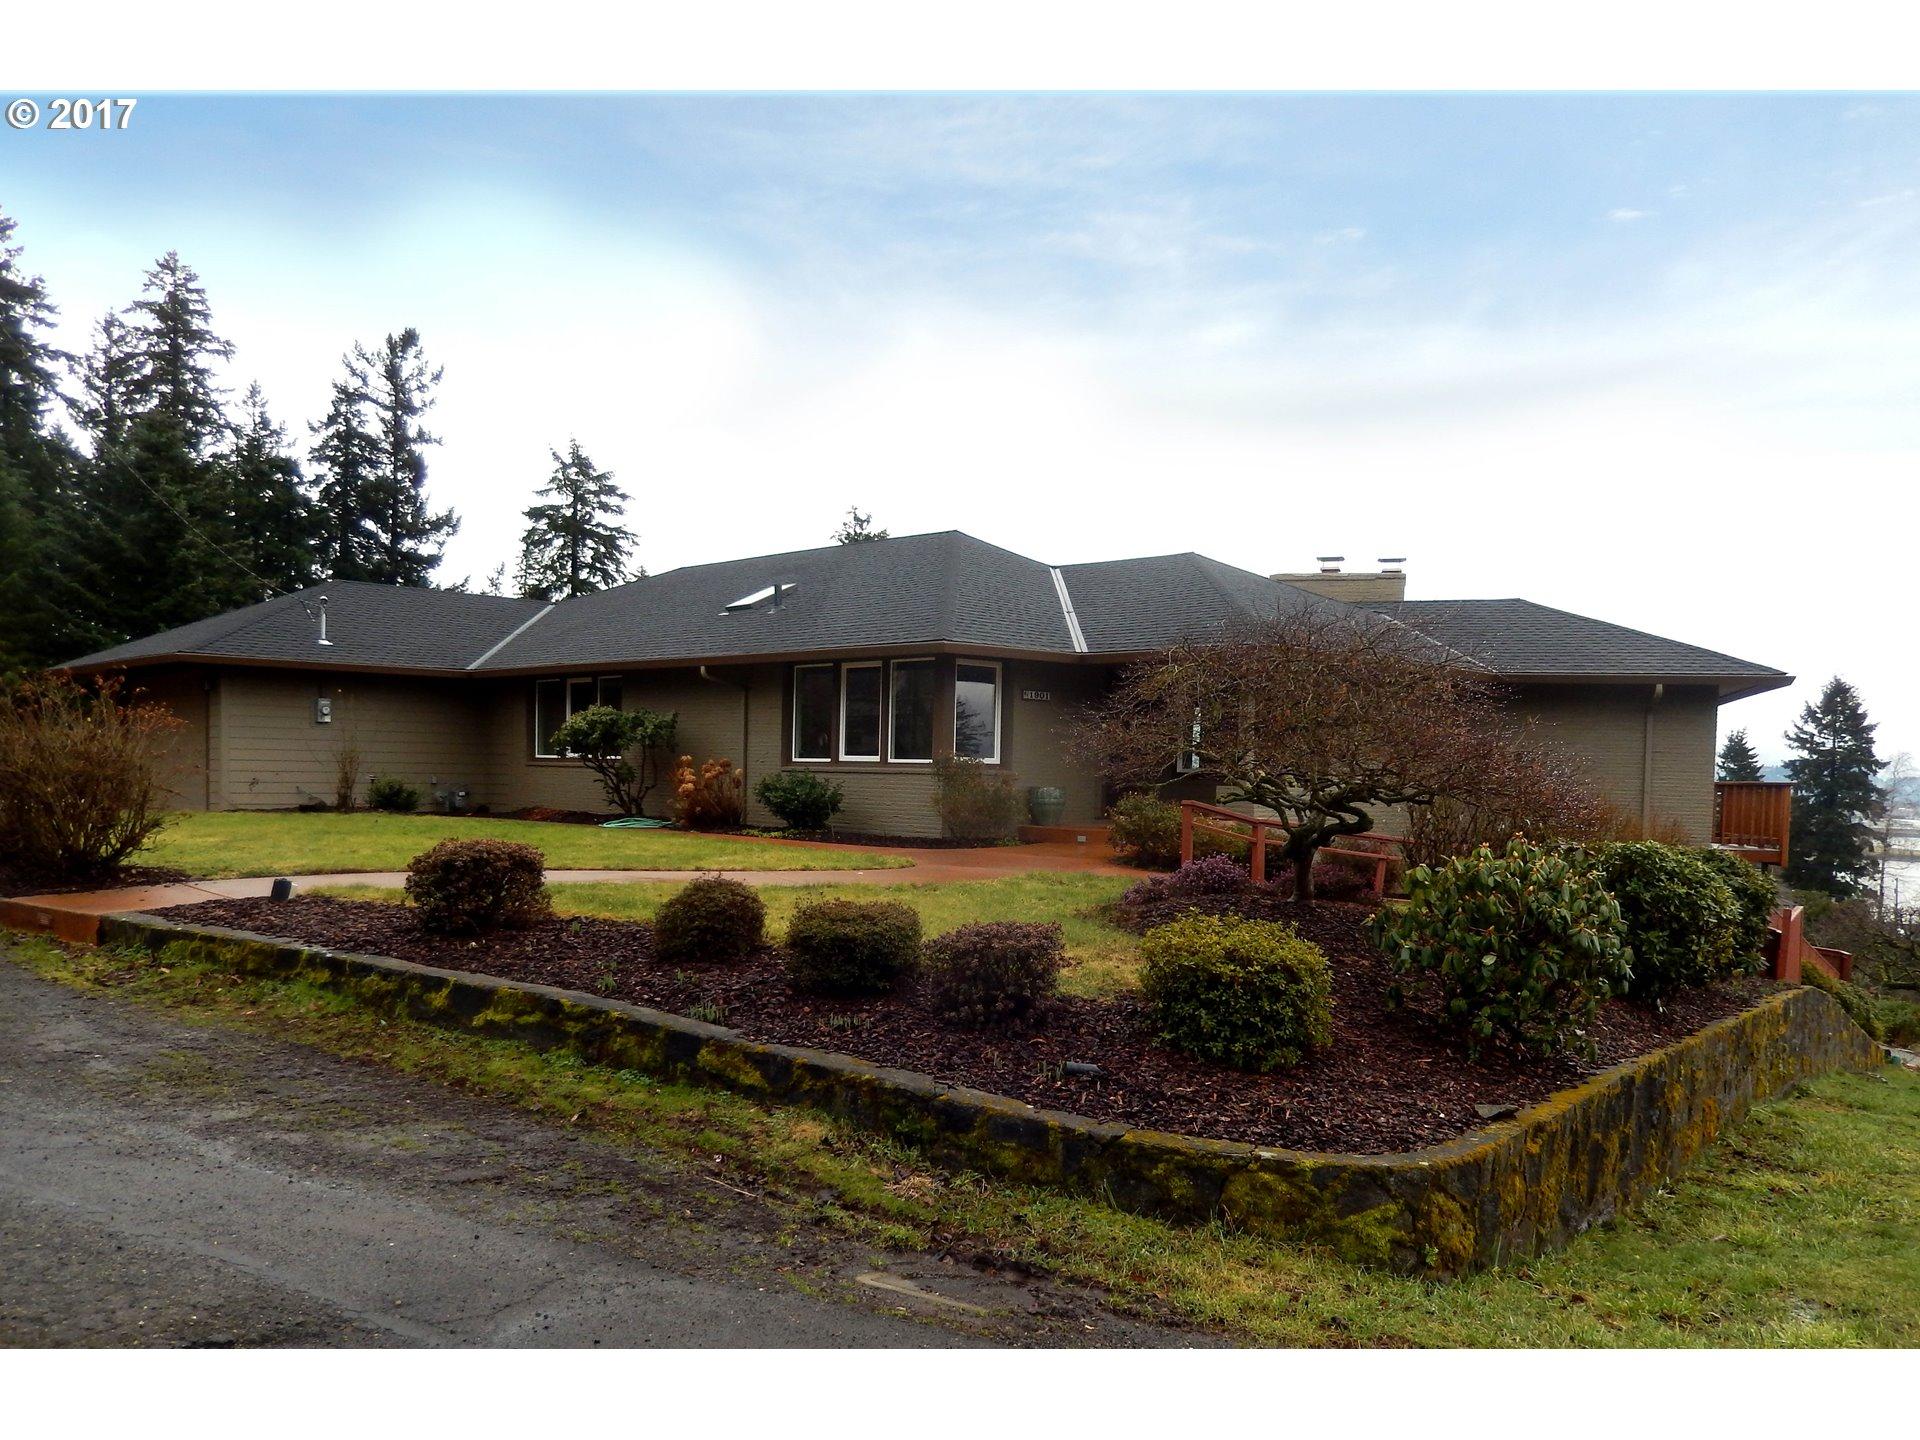 1901 SE 97TH AVE, Vancouver, WA 98664